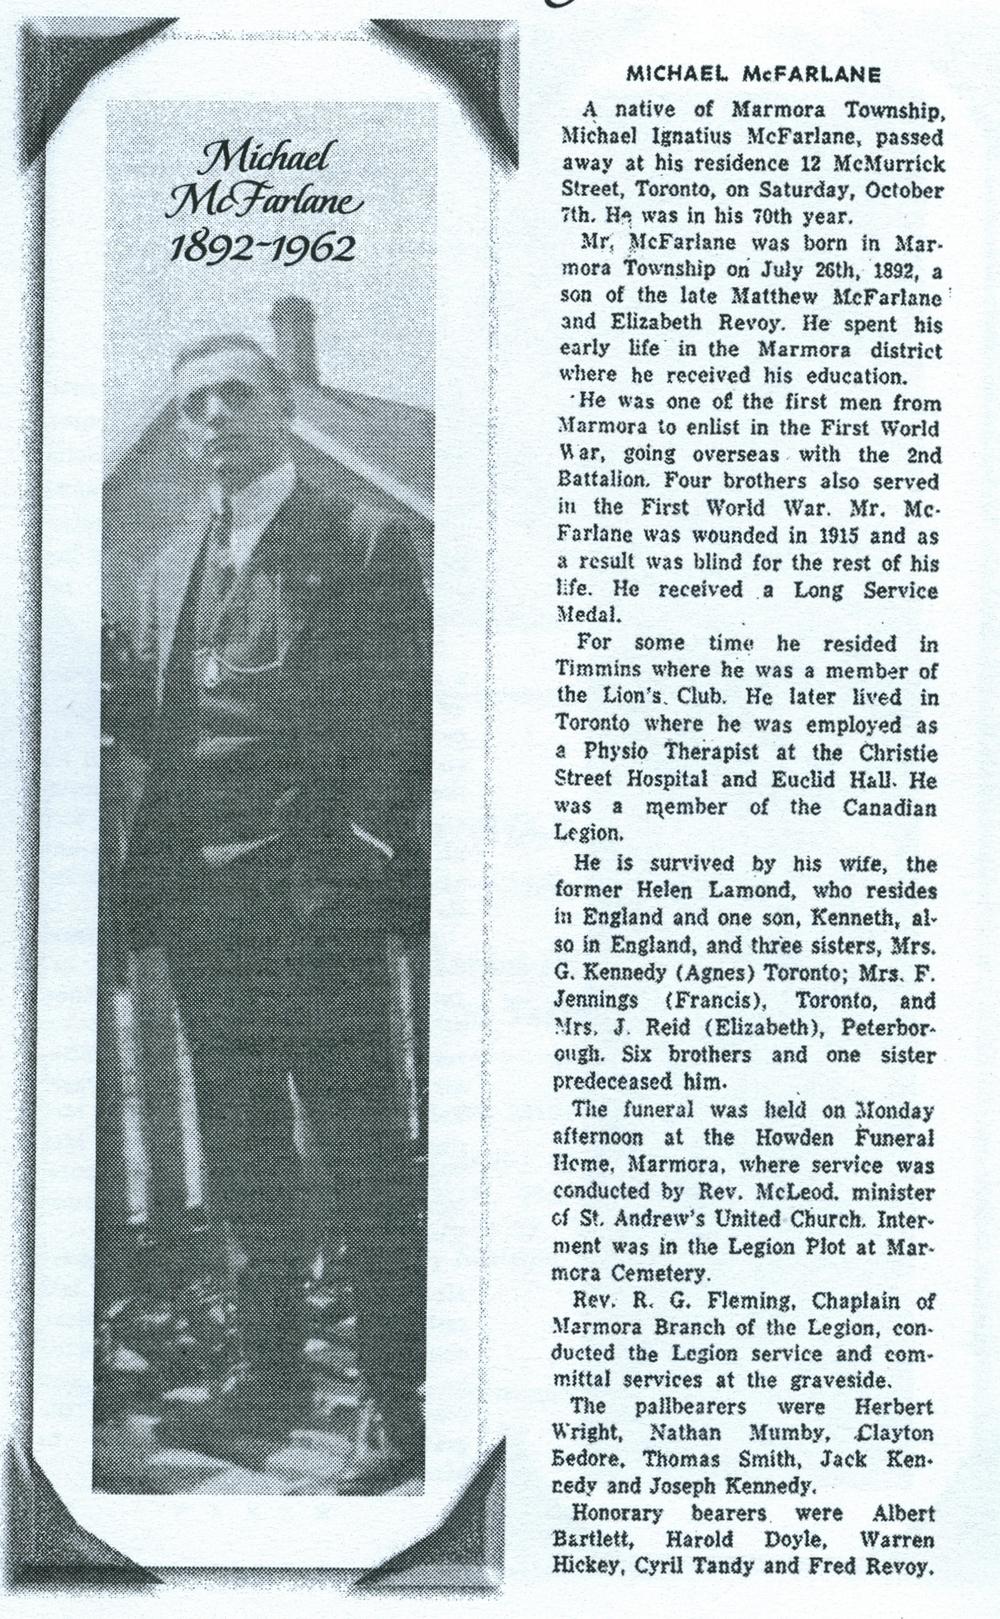 McFarlane, Michael, 1892-1962,.jpg